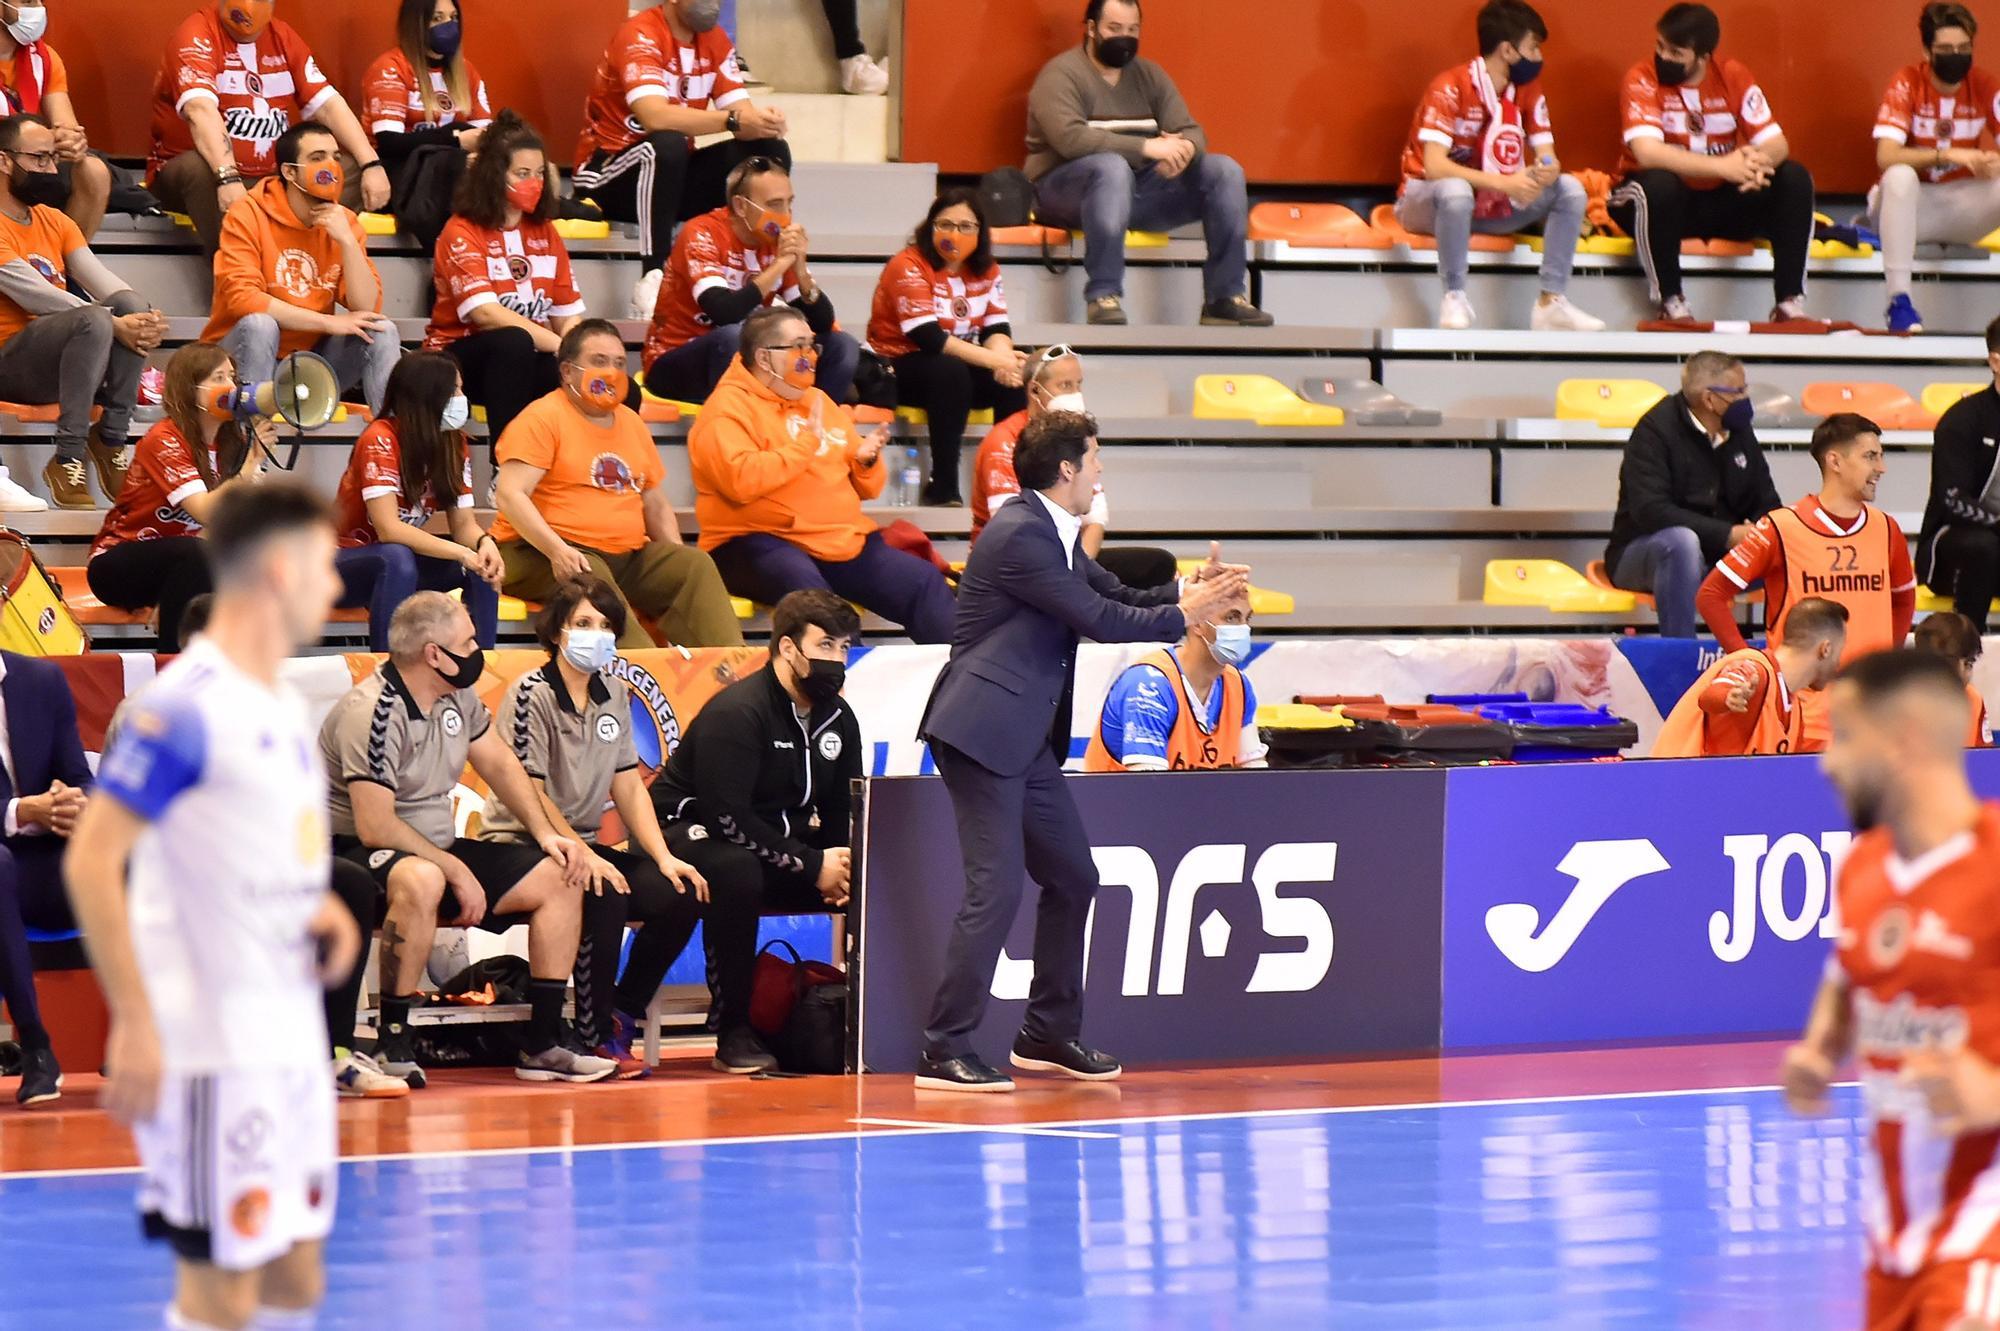 Jimbee Cartagena vs Emotion Zaragoza